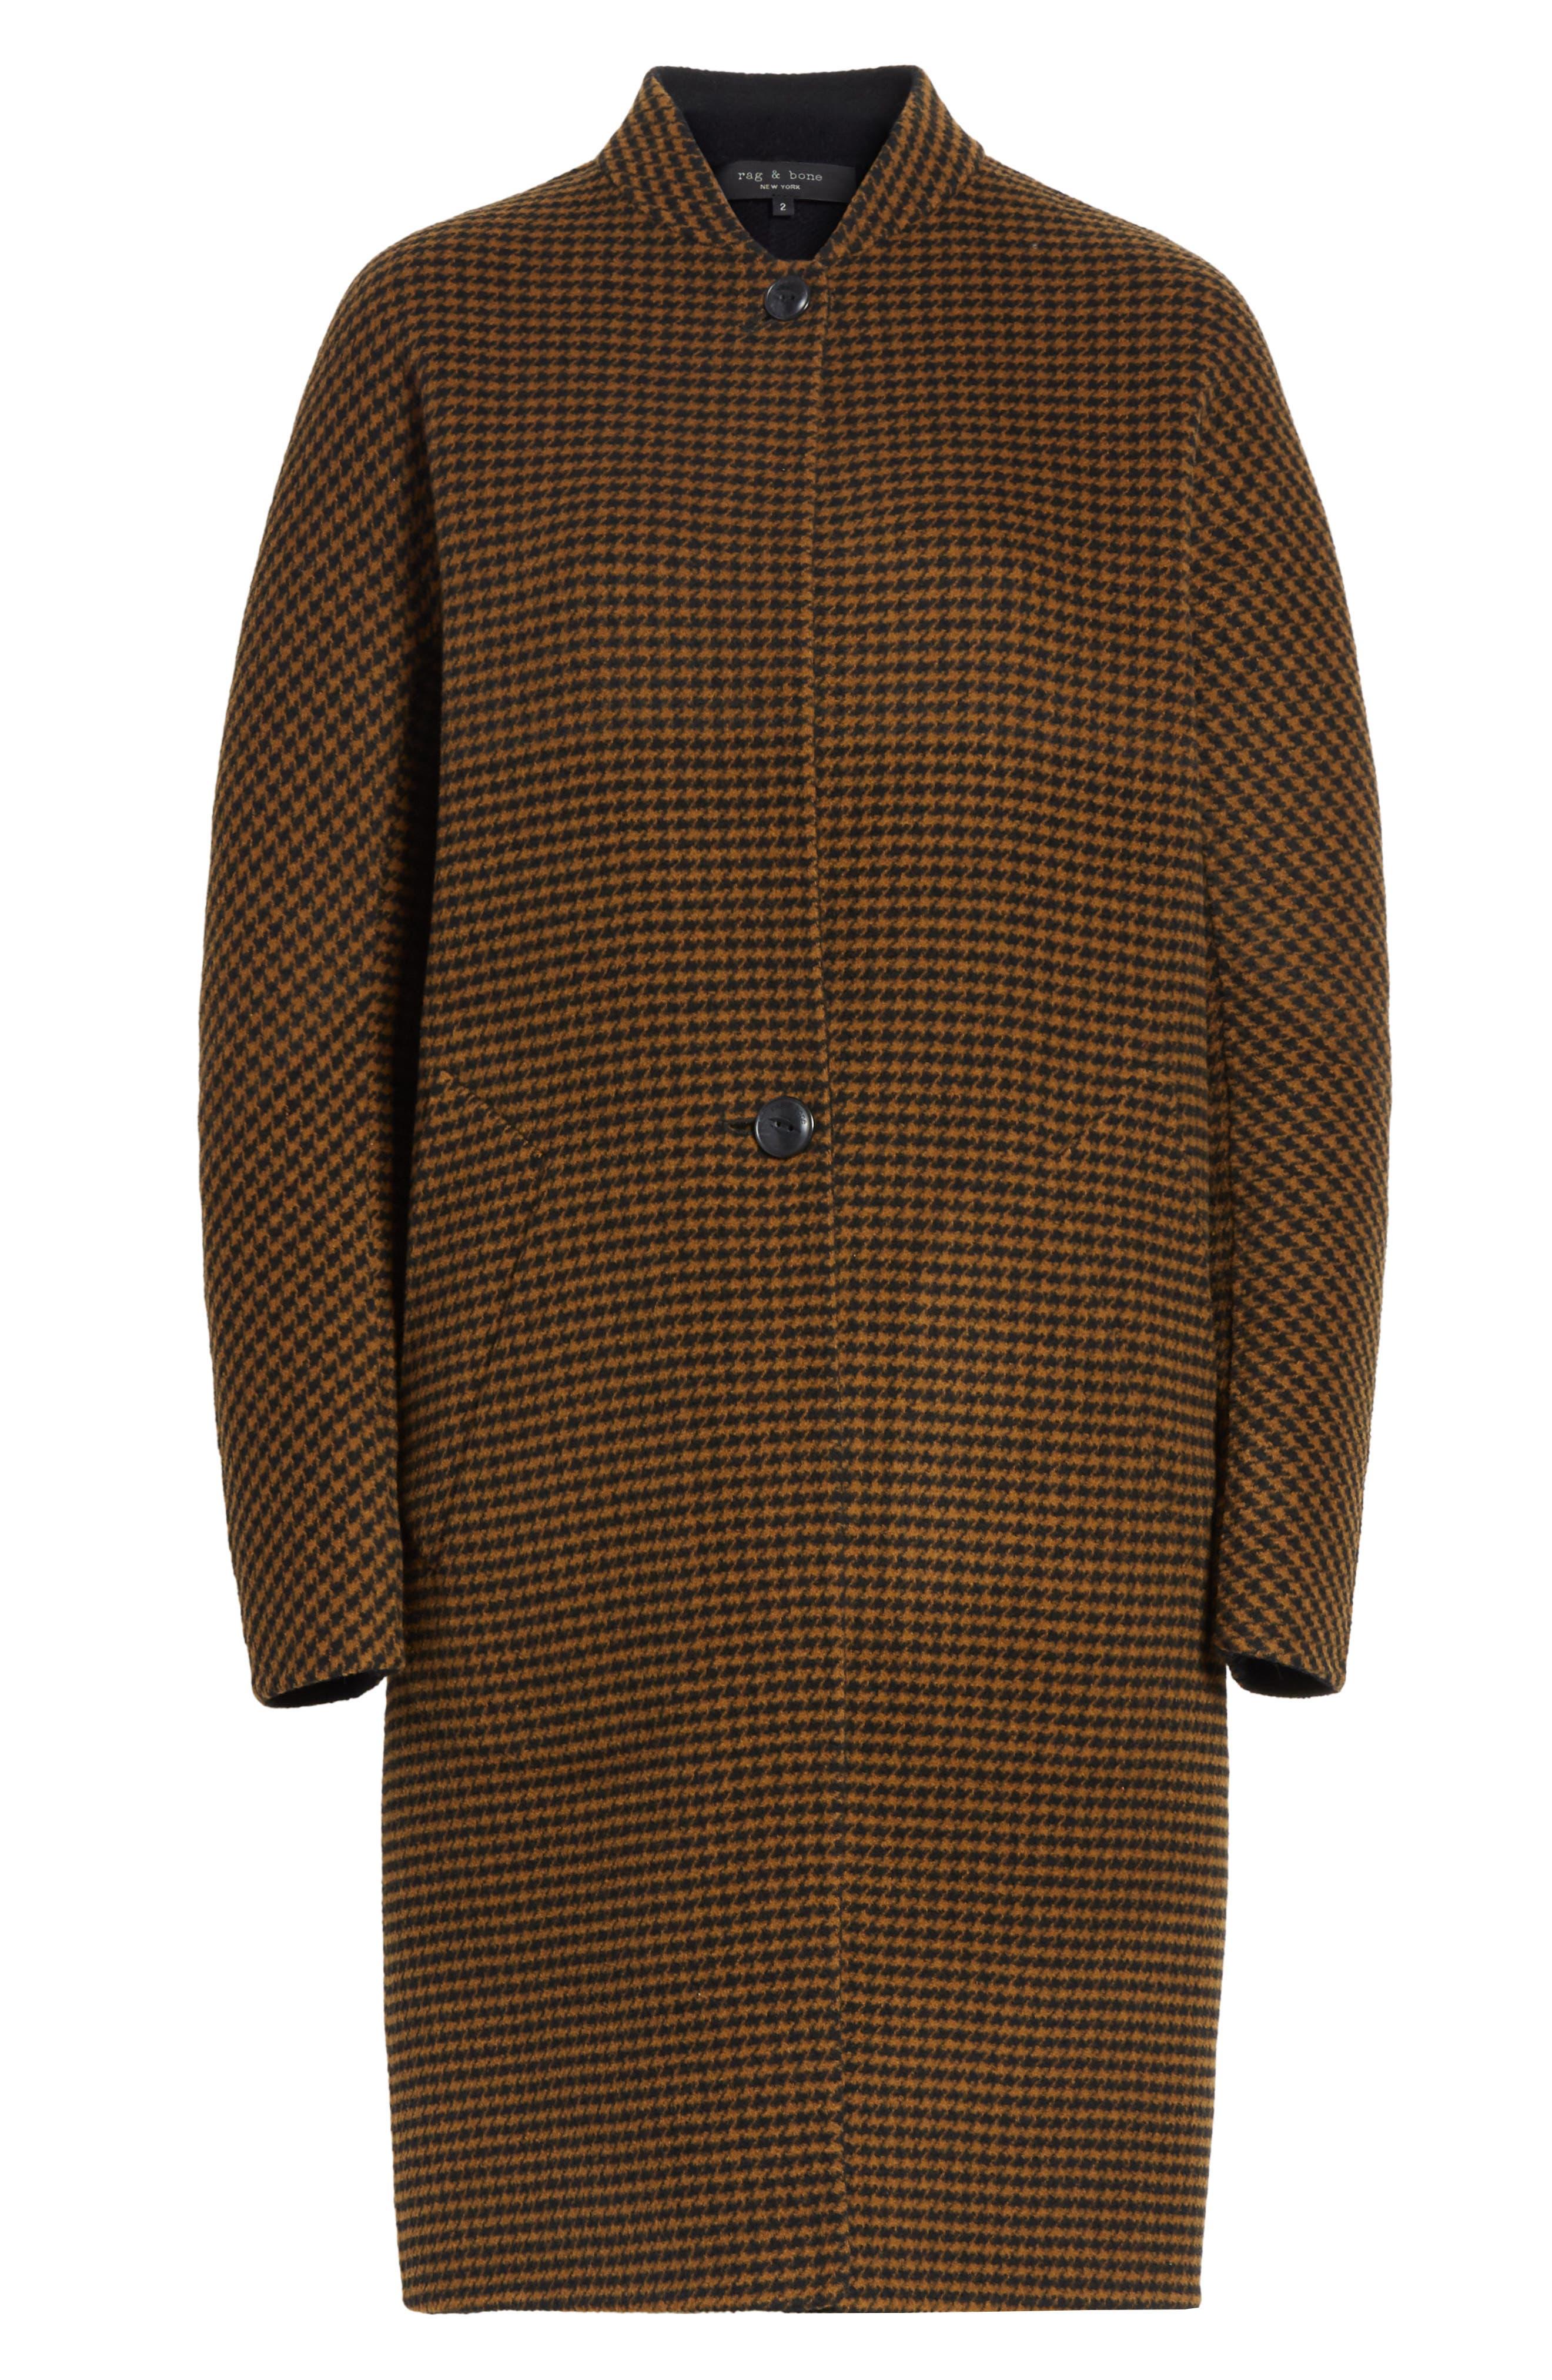 Darwen Reversible Wool & Cashmere Coat,                             Alternate thumbnail 7, color,                             Brown/Black